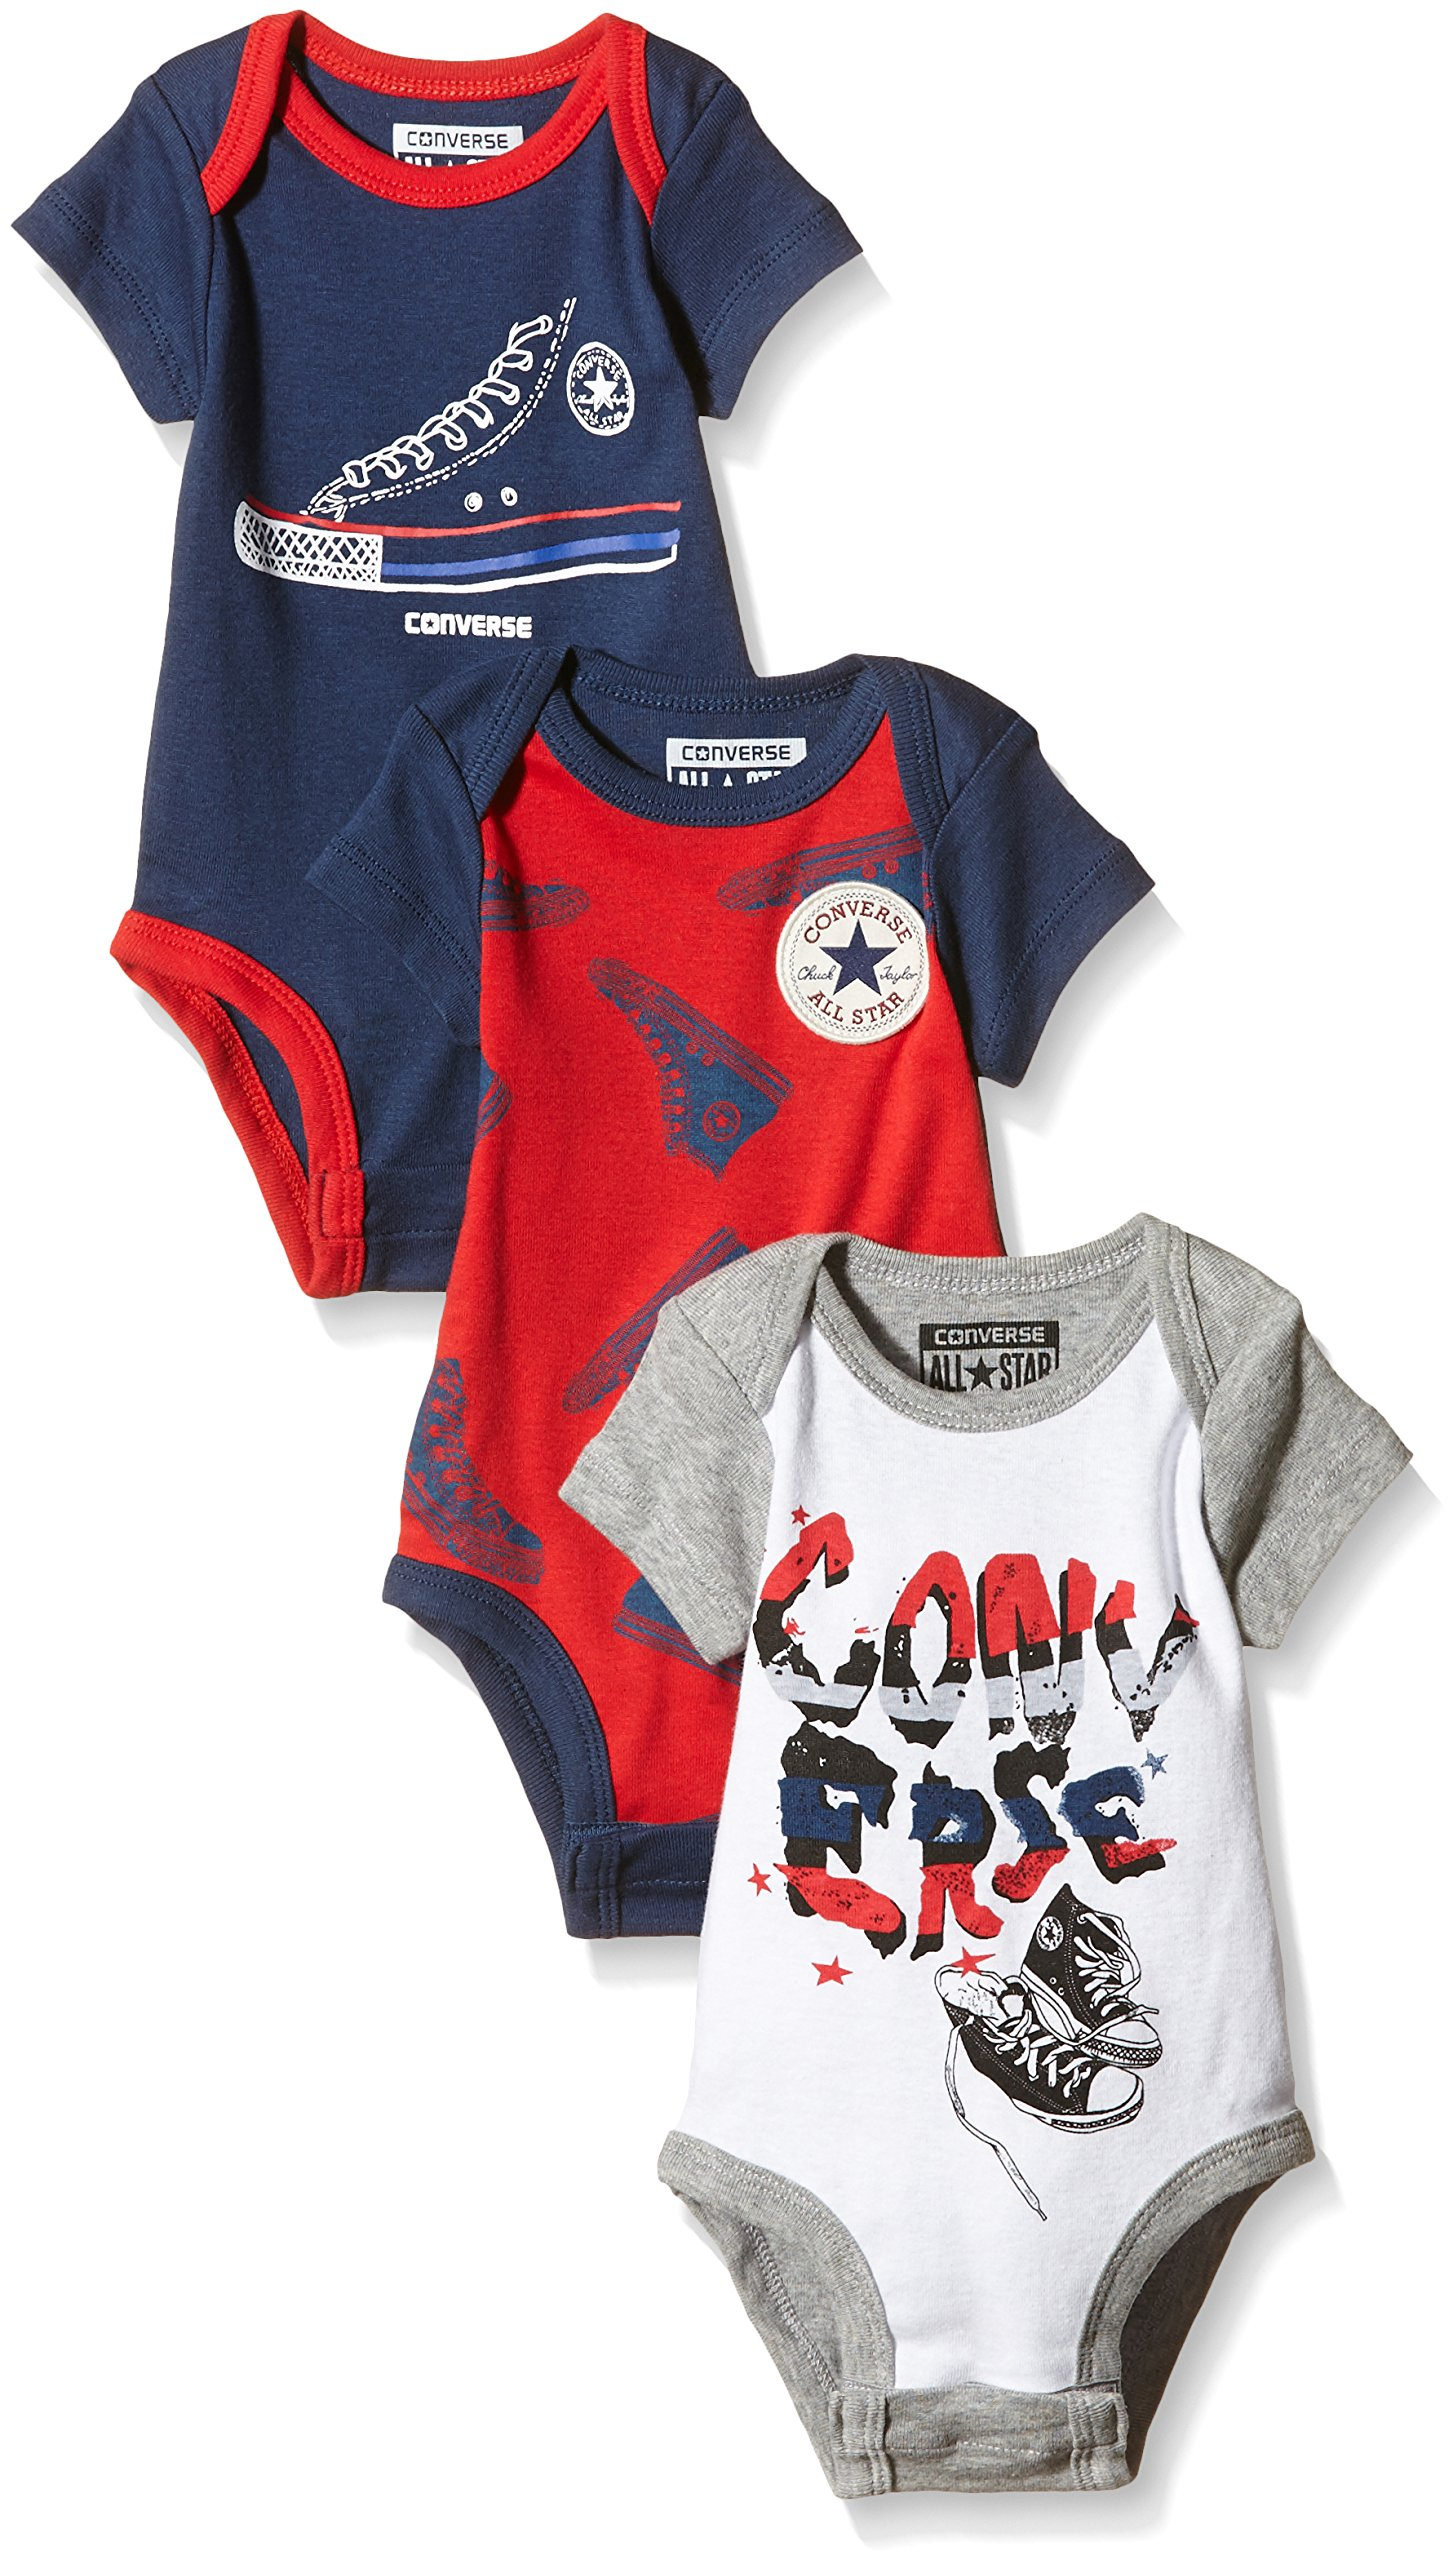 Converse Baby Boys' Clothing Set- Buy